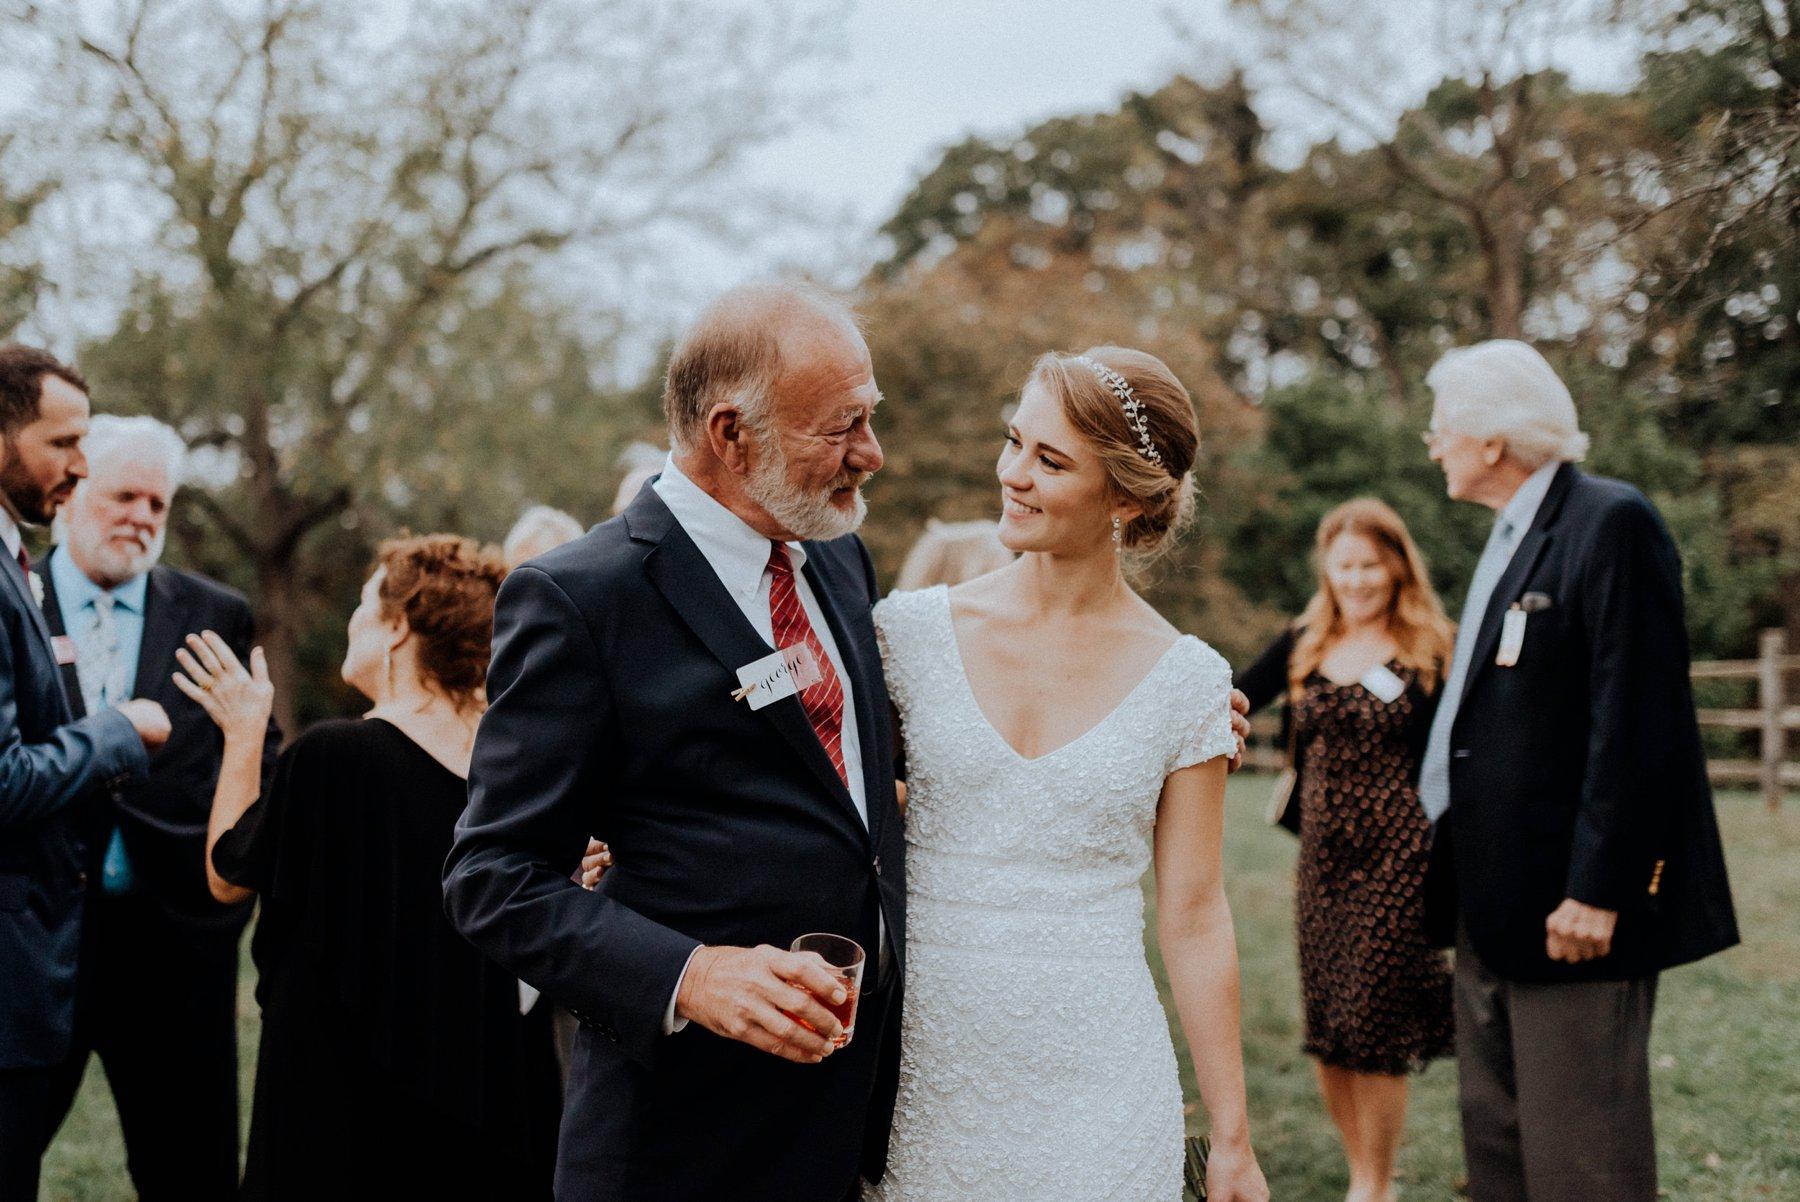 115-100-john-james-audubon-center-wedding-14.jpg